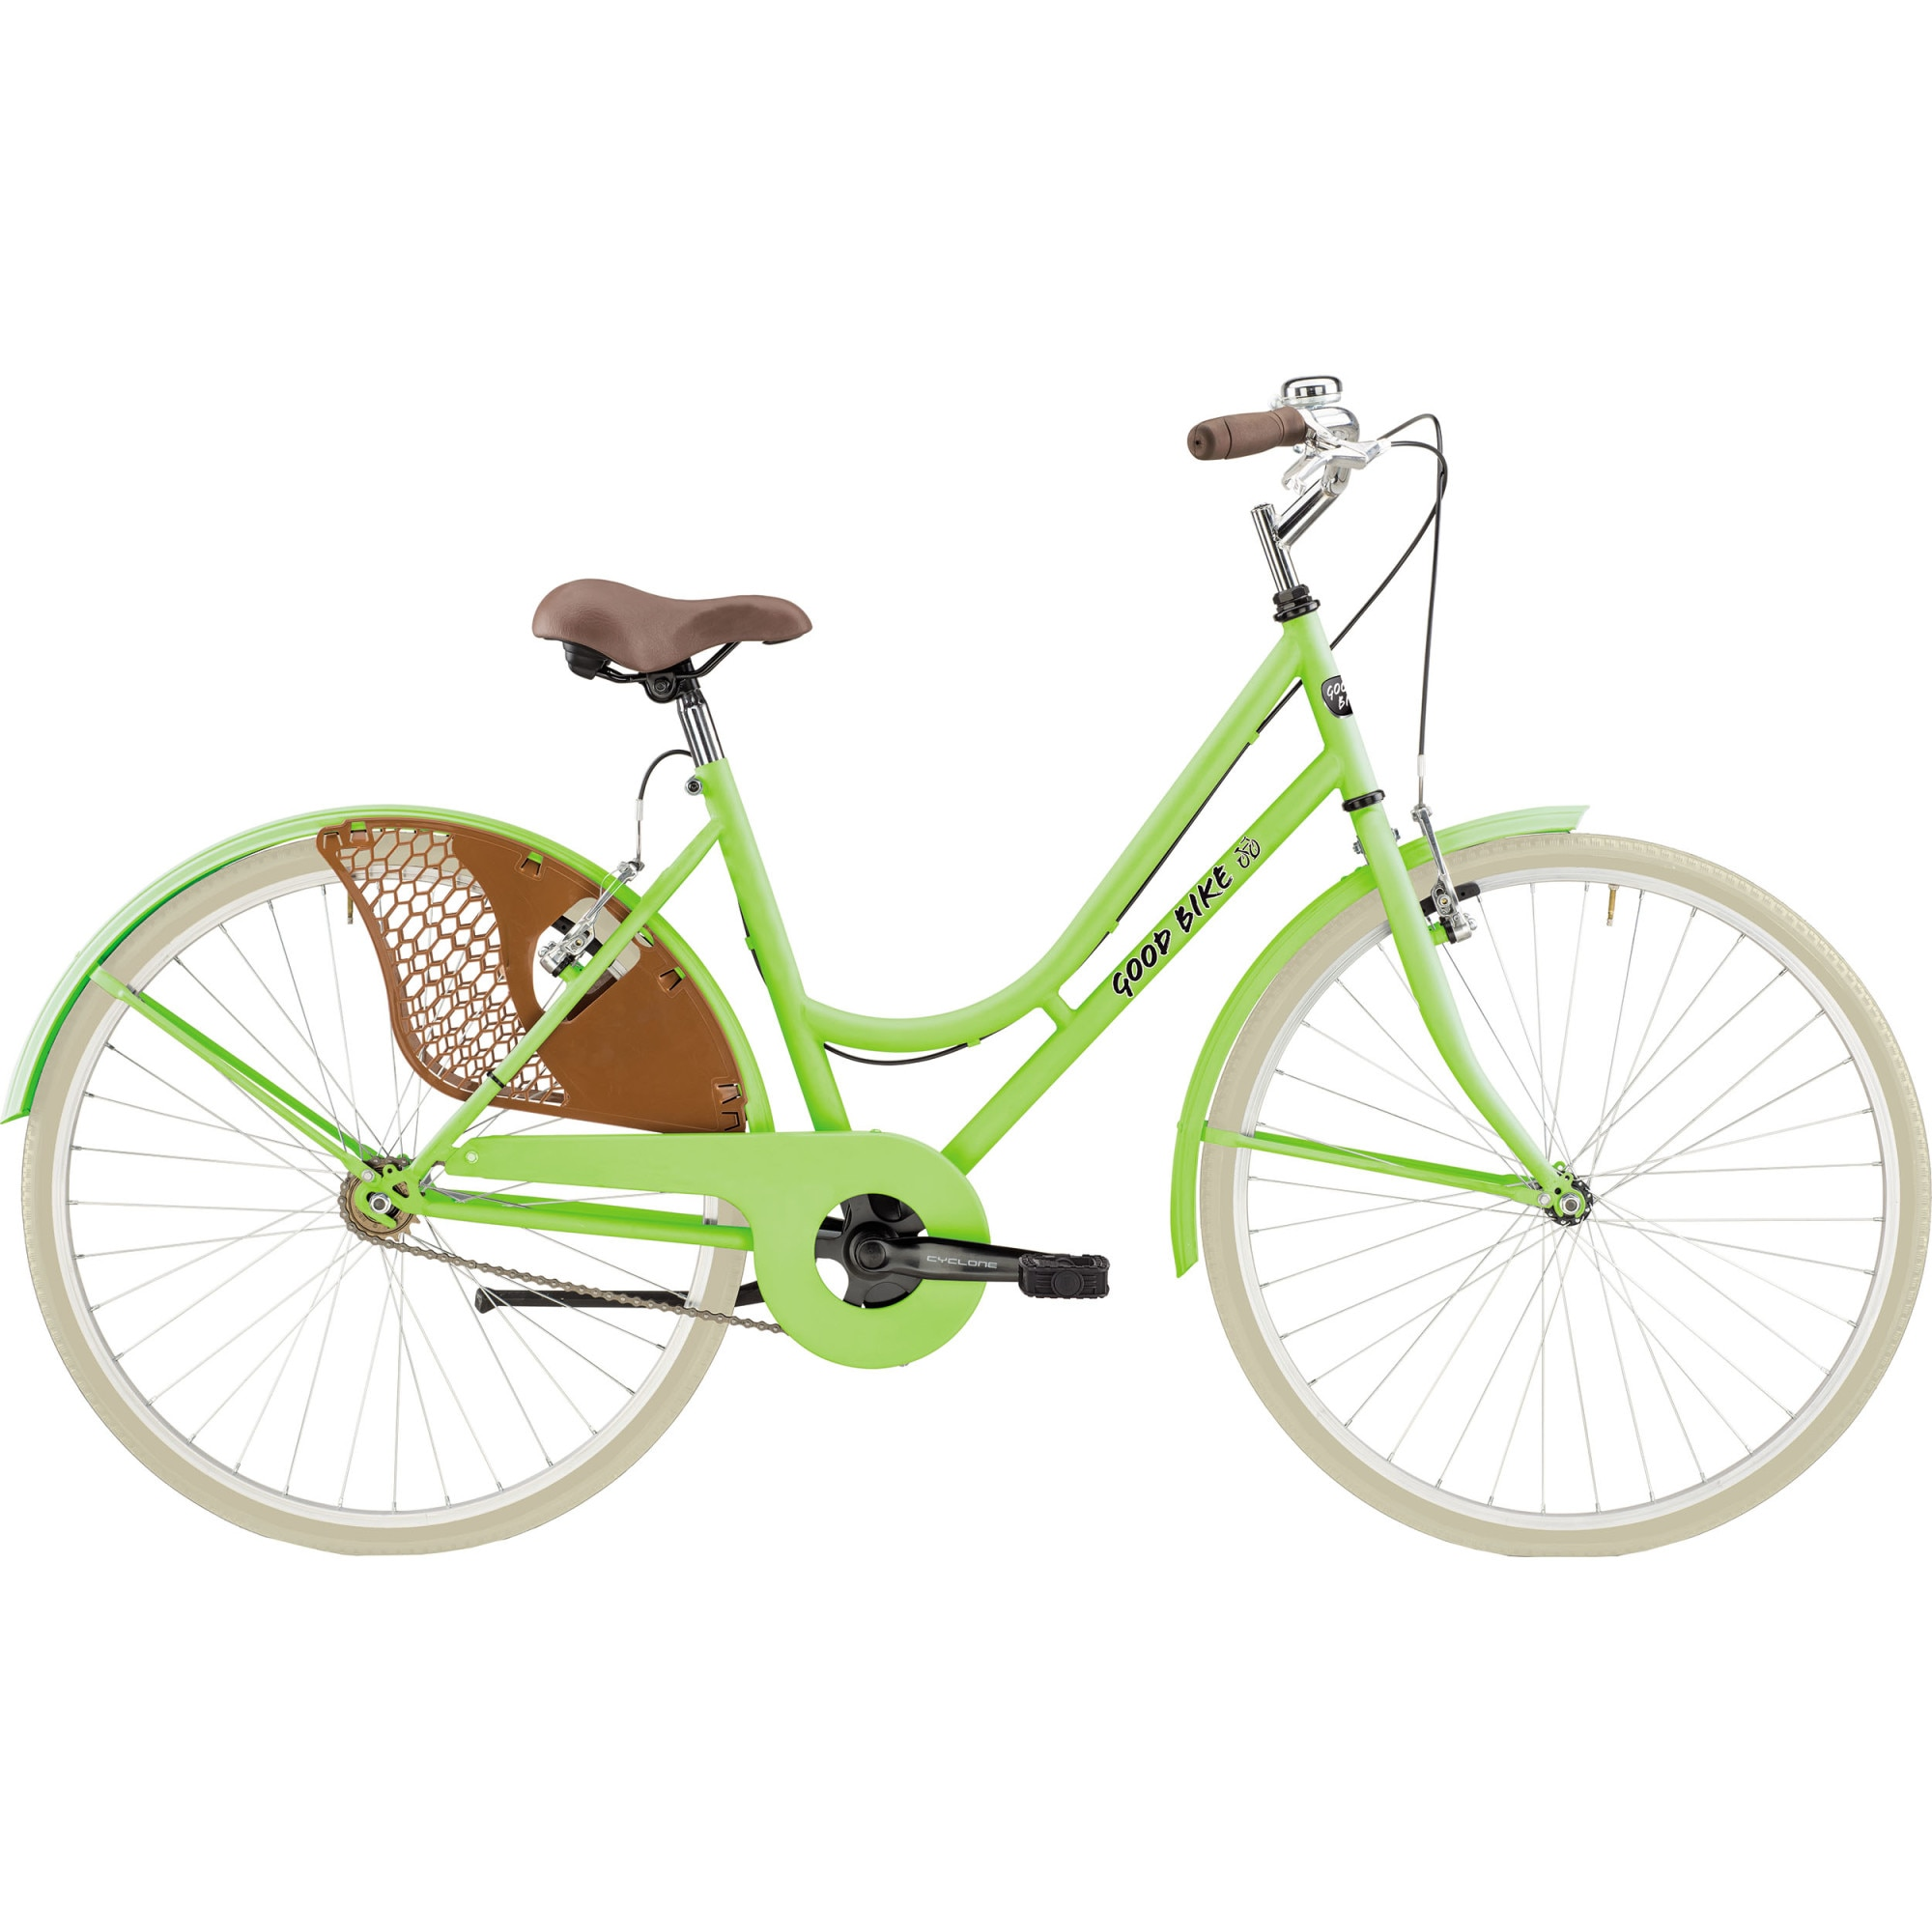 "Fotografie Bicicleta City 26"" Esperia Vintage Donna 1V, Apple Green"